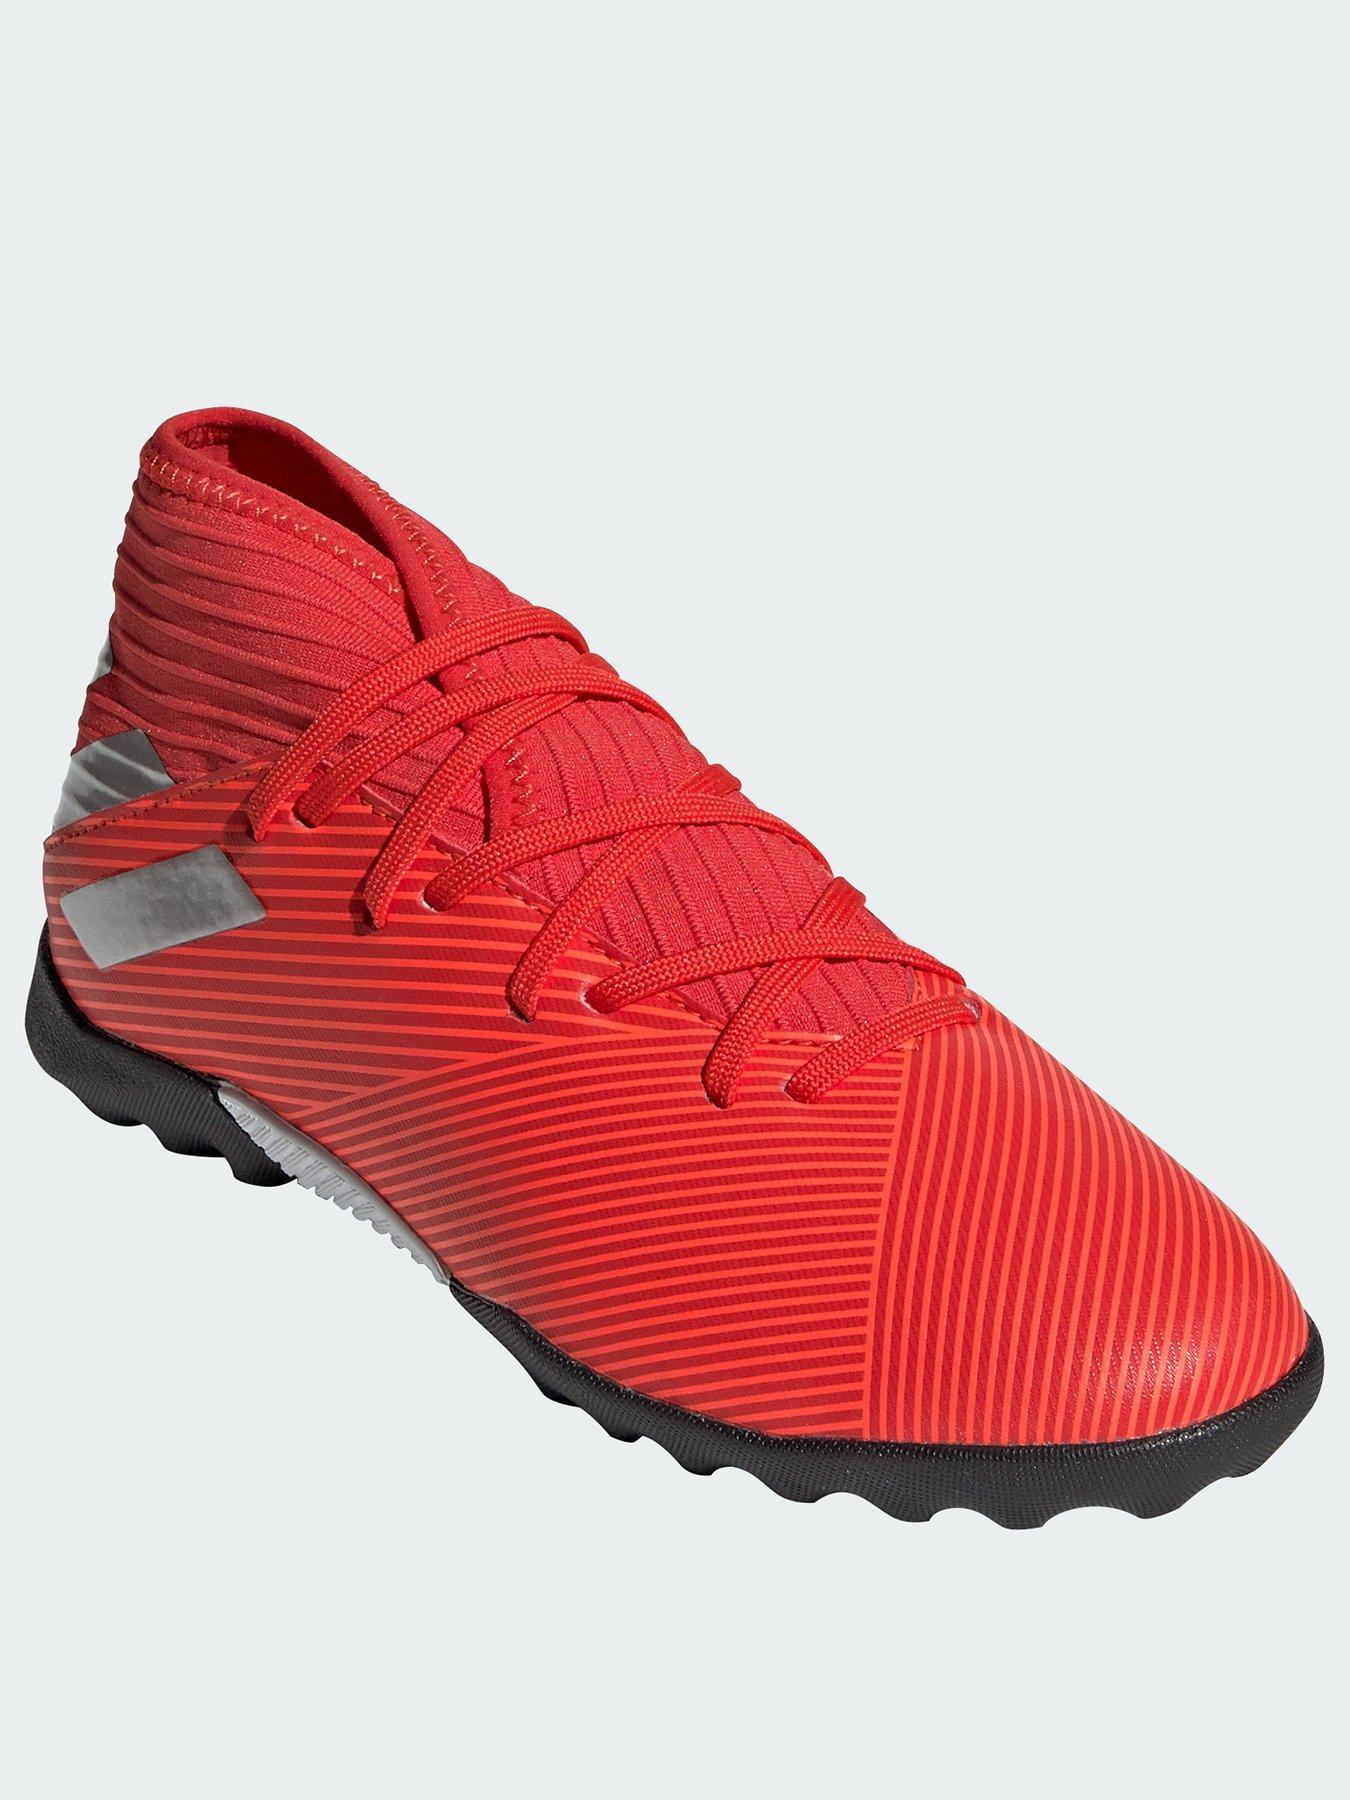 6d6763ec5 ... nemeziz 19.3 astro turf boots red; adidas junior nemeziz 19.3 astro  turf boots red; adidas nemeziz 19.1 fg ag 302 redirect action red silver  metallic